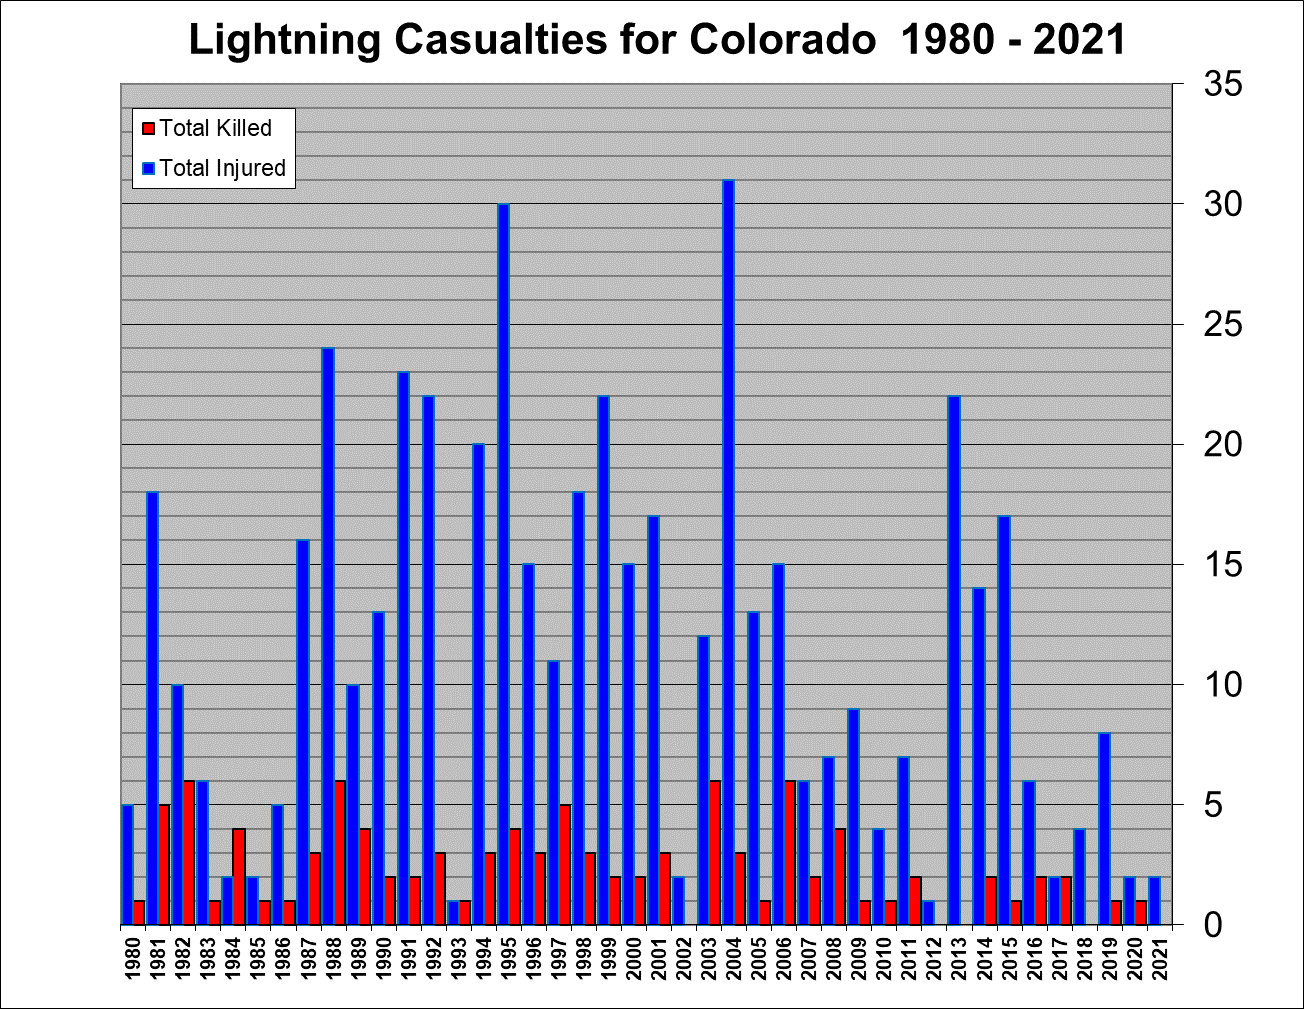 Colorado lightning casualties 1980-2019